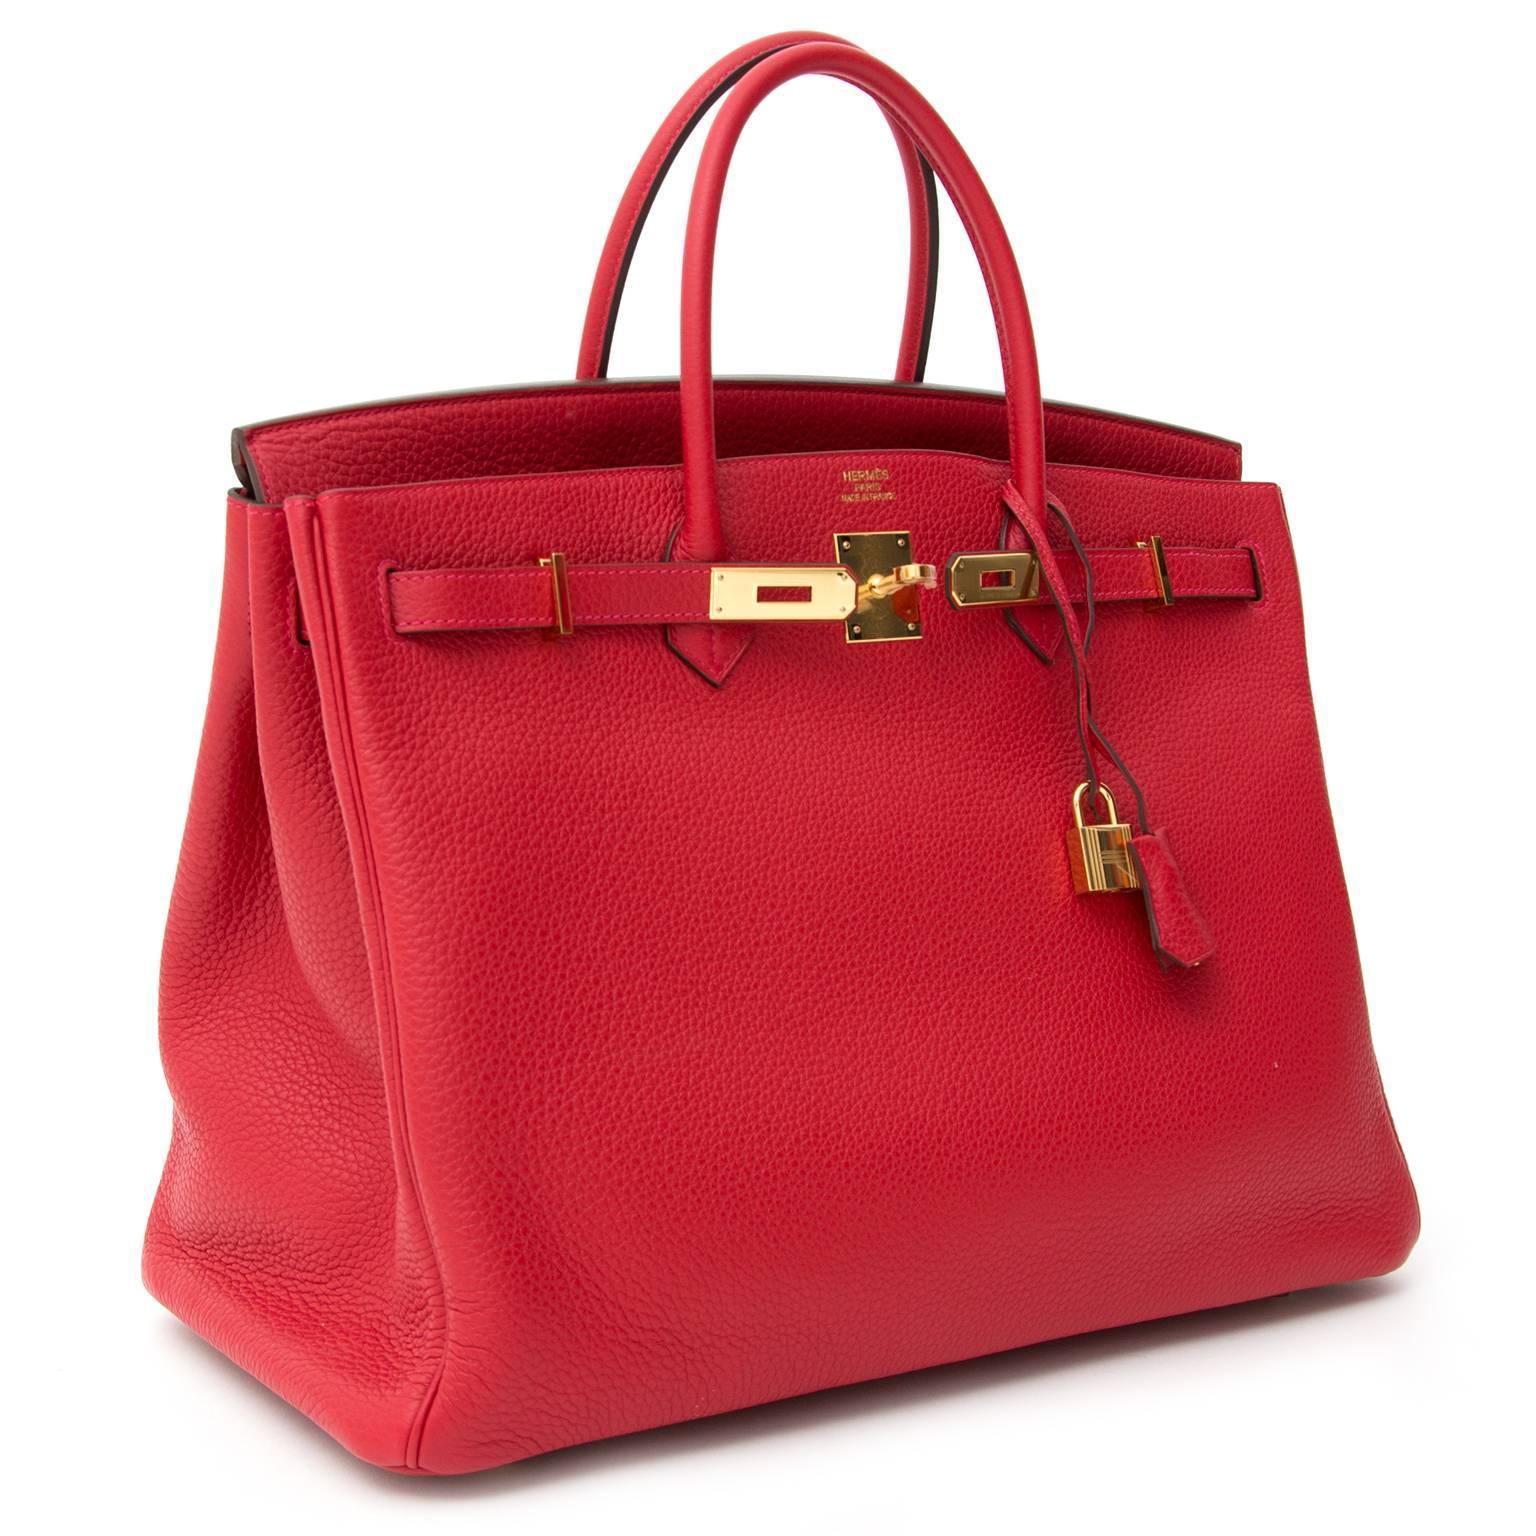 816f4d4a5d75 Brand New Hermès Birkin 40 Clemence Taurillon Rouge Casaque GHW at 1stdibs